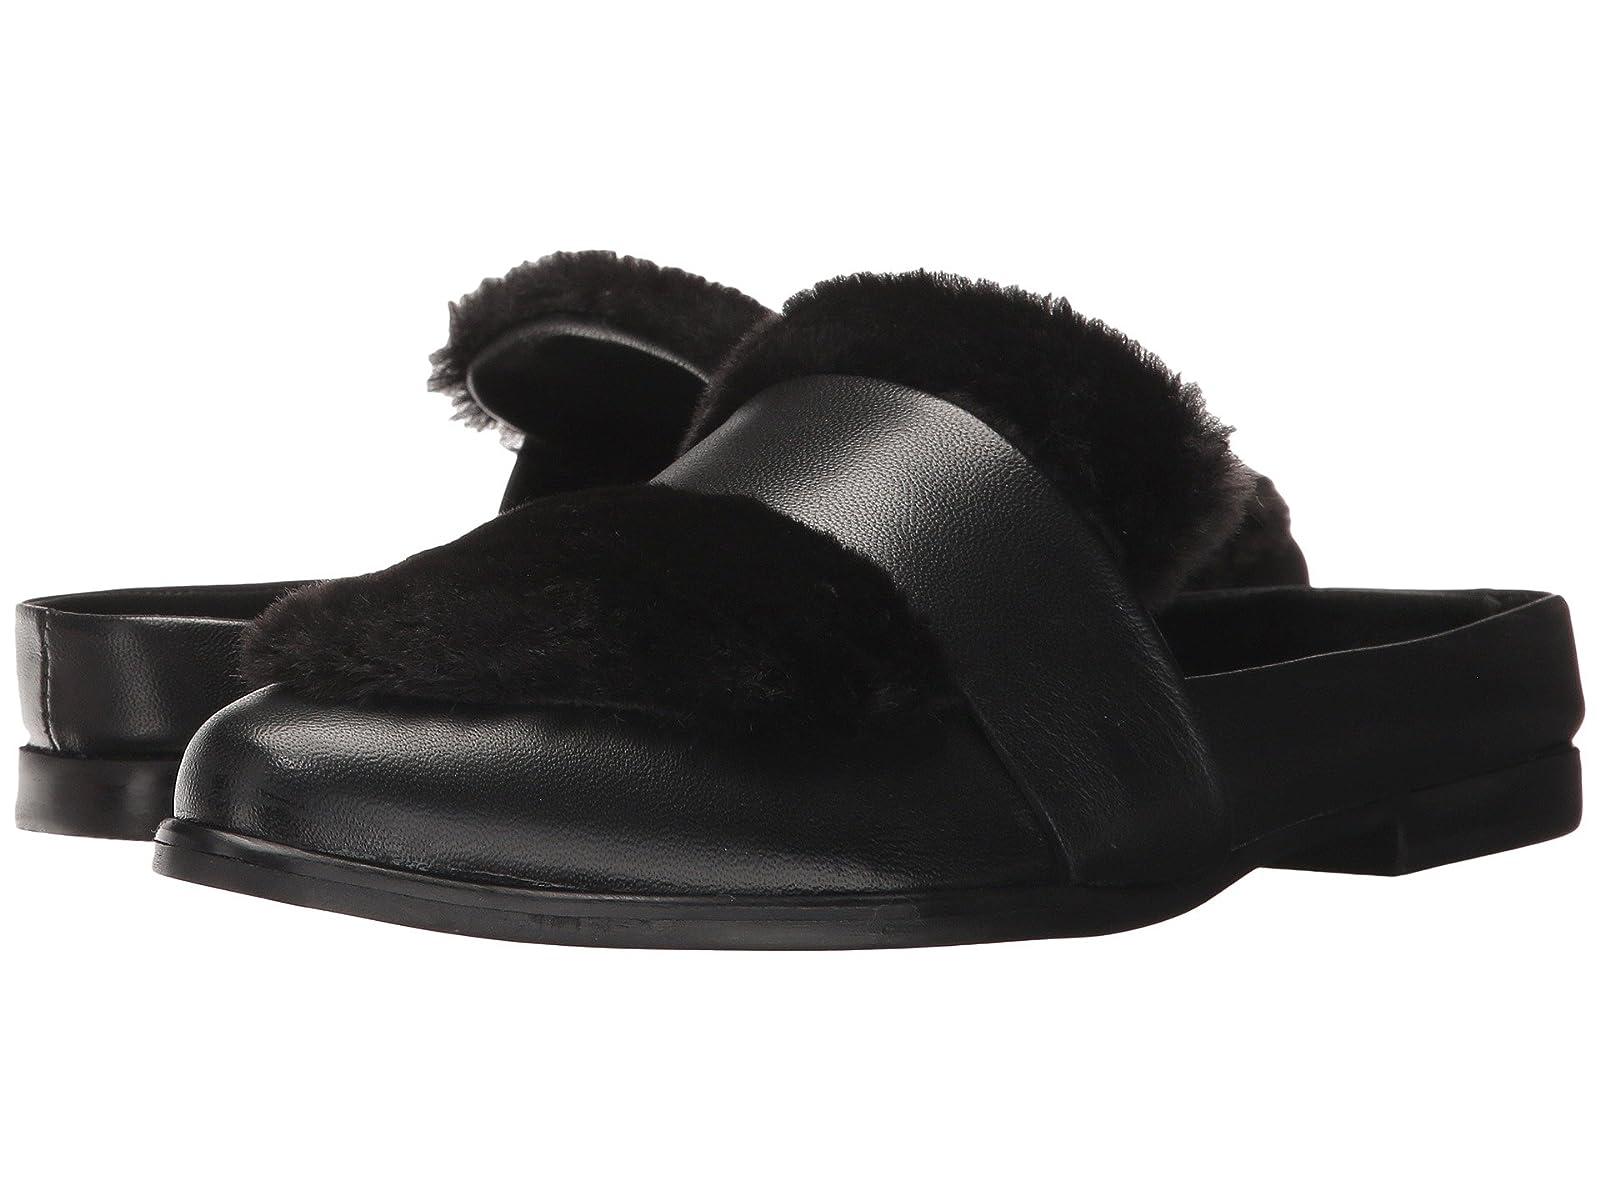 Sol Sana Tuesday SlideAtmospheric grades have affordable shoes